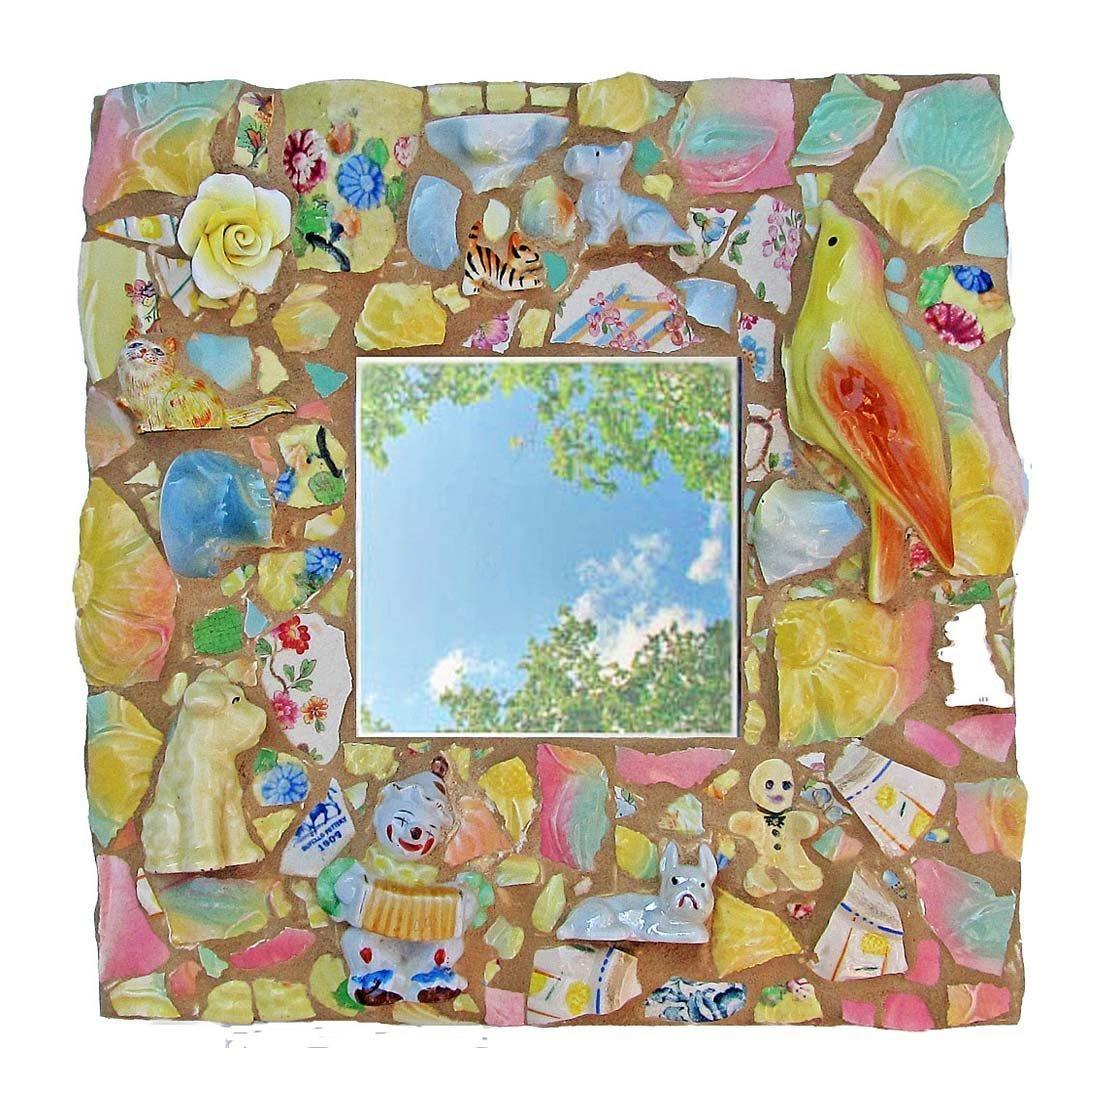 Pique Assiette Mosaic Children's Animal Mirror by Melissa's Motifs Mosaics